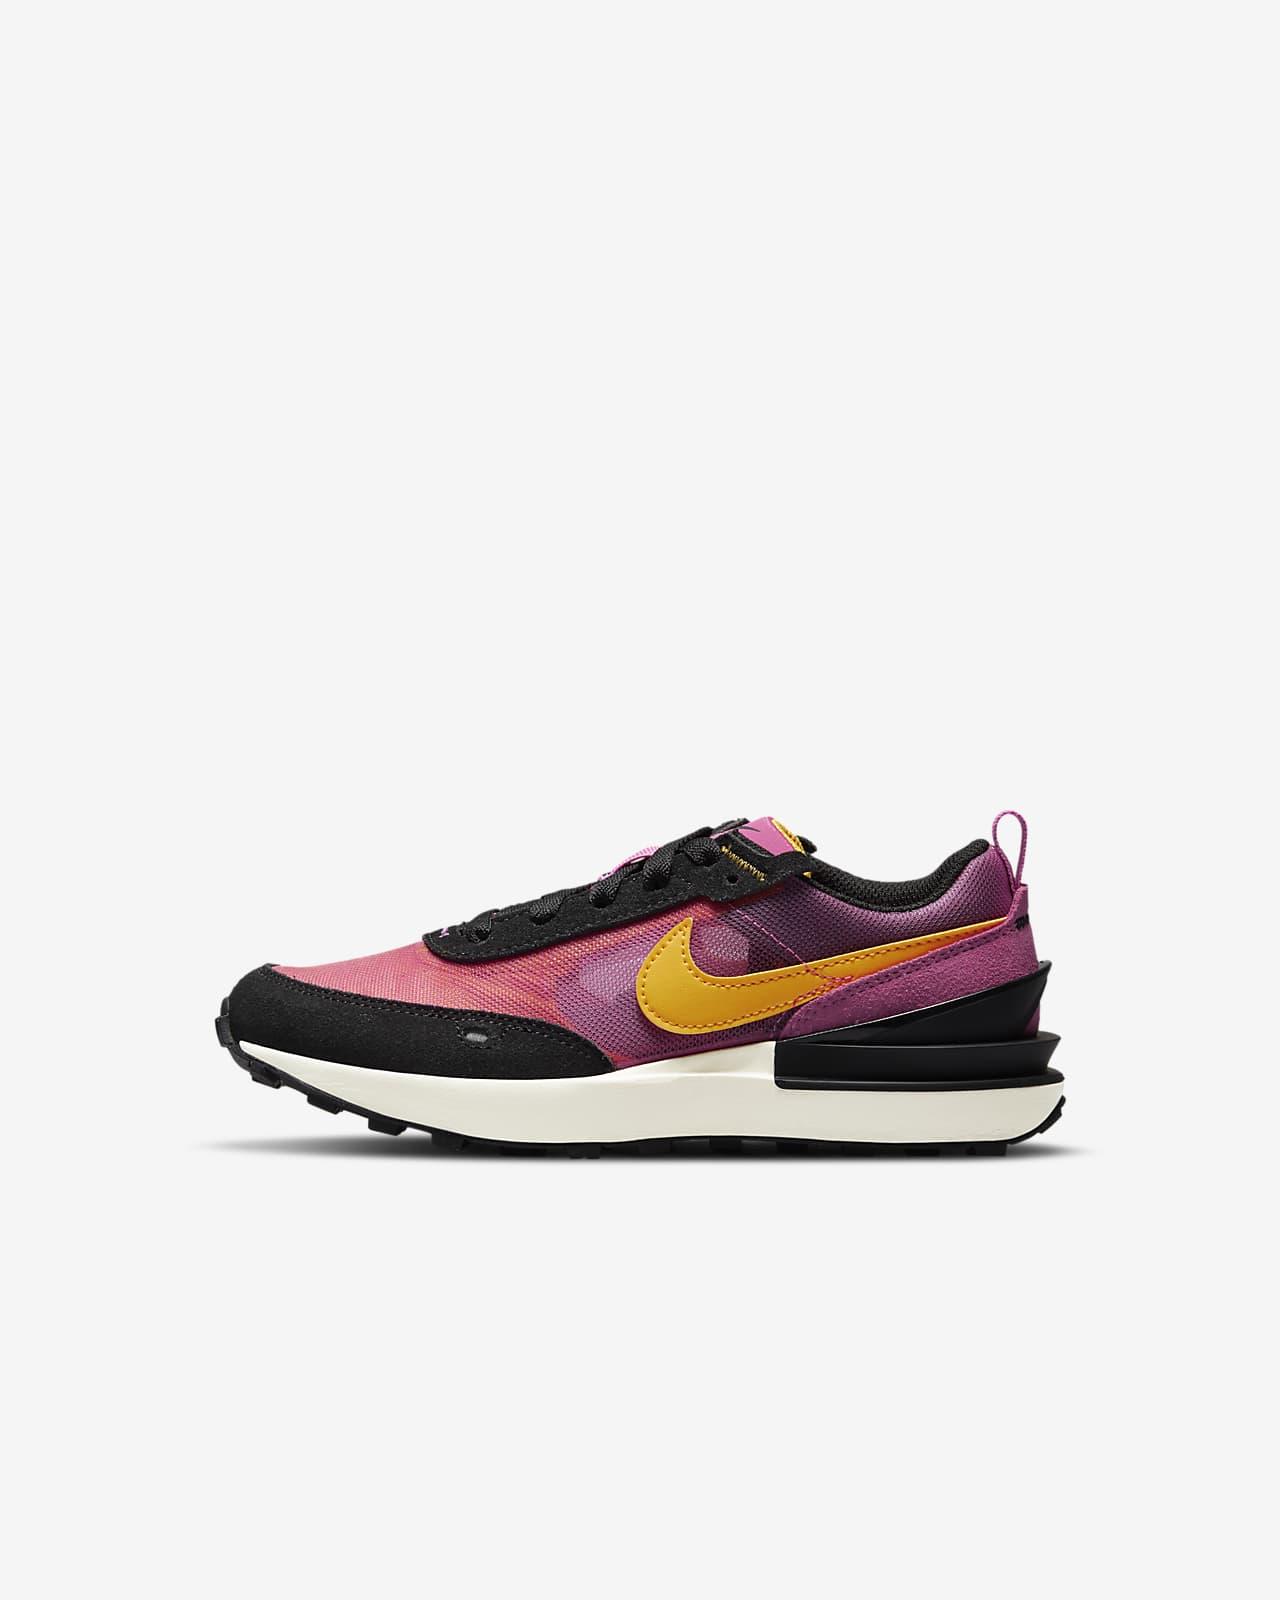 Nike Waffle One Younger Kids' Shoe